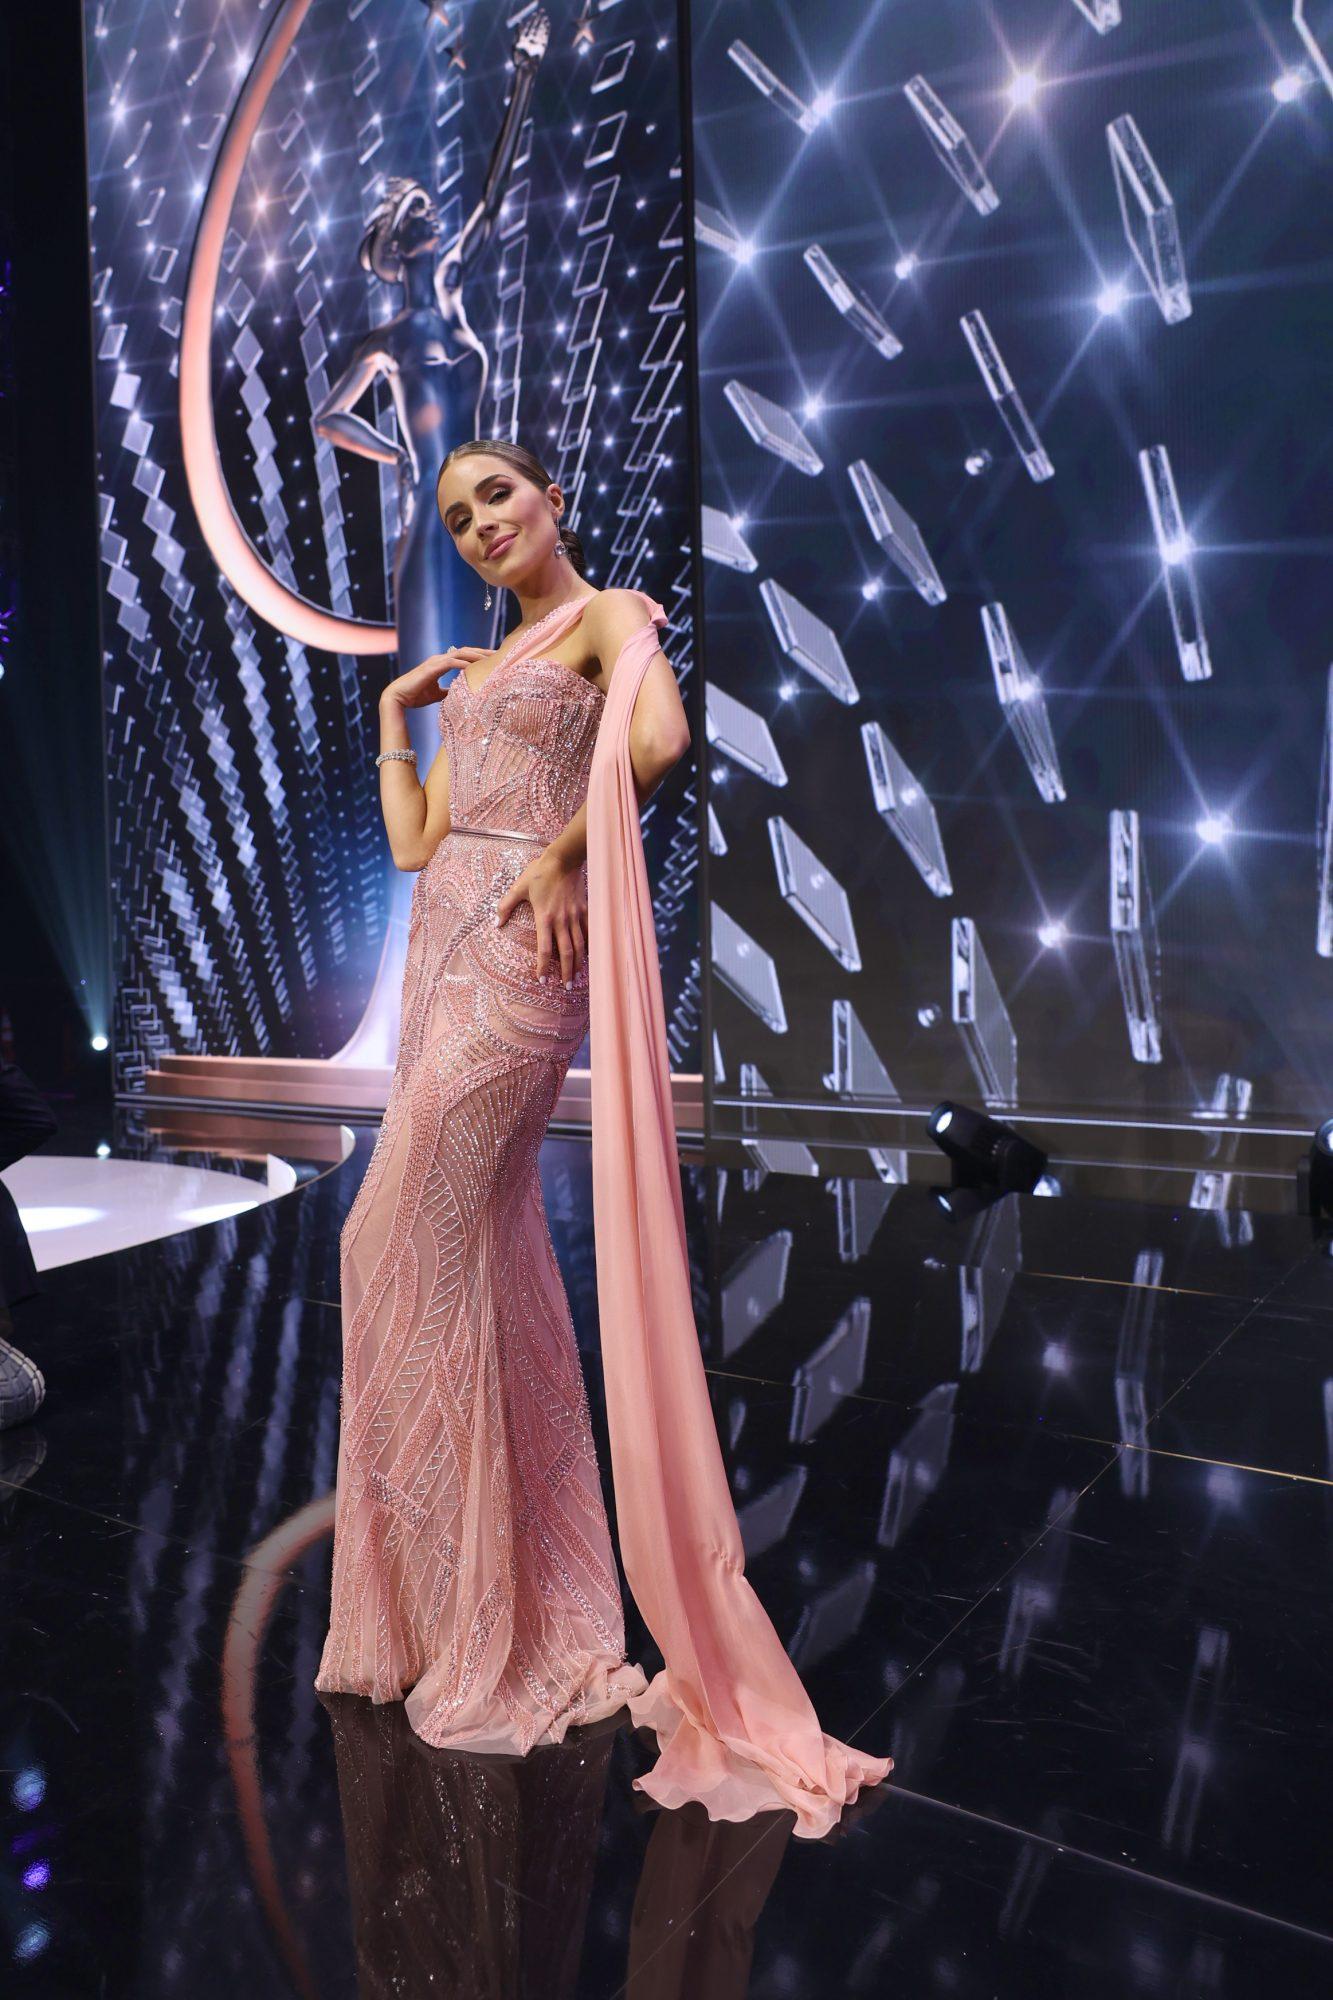 Miss Universo presentadoras, Olivia Culpo